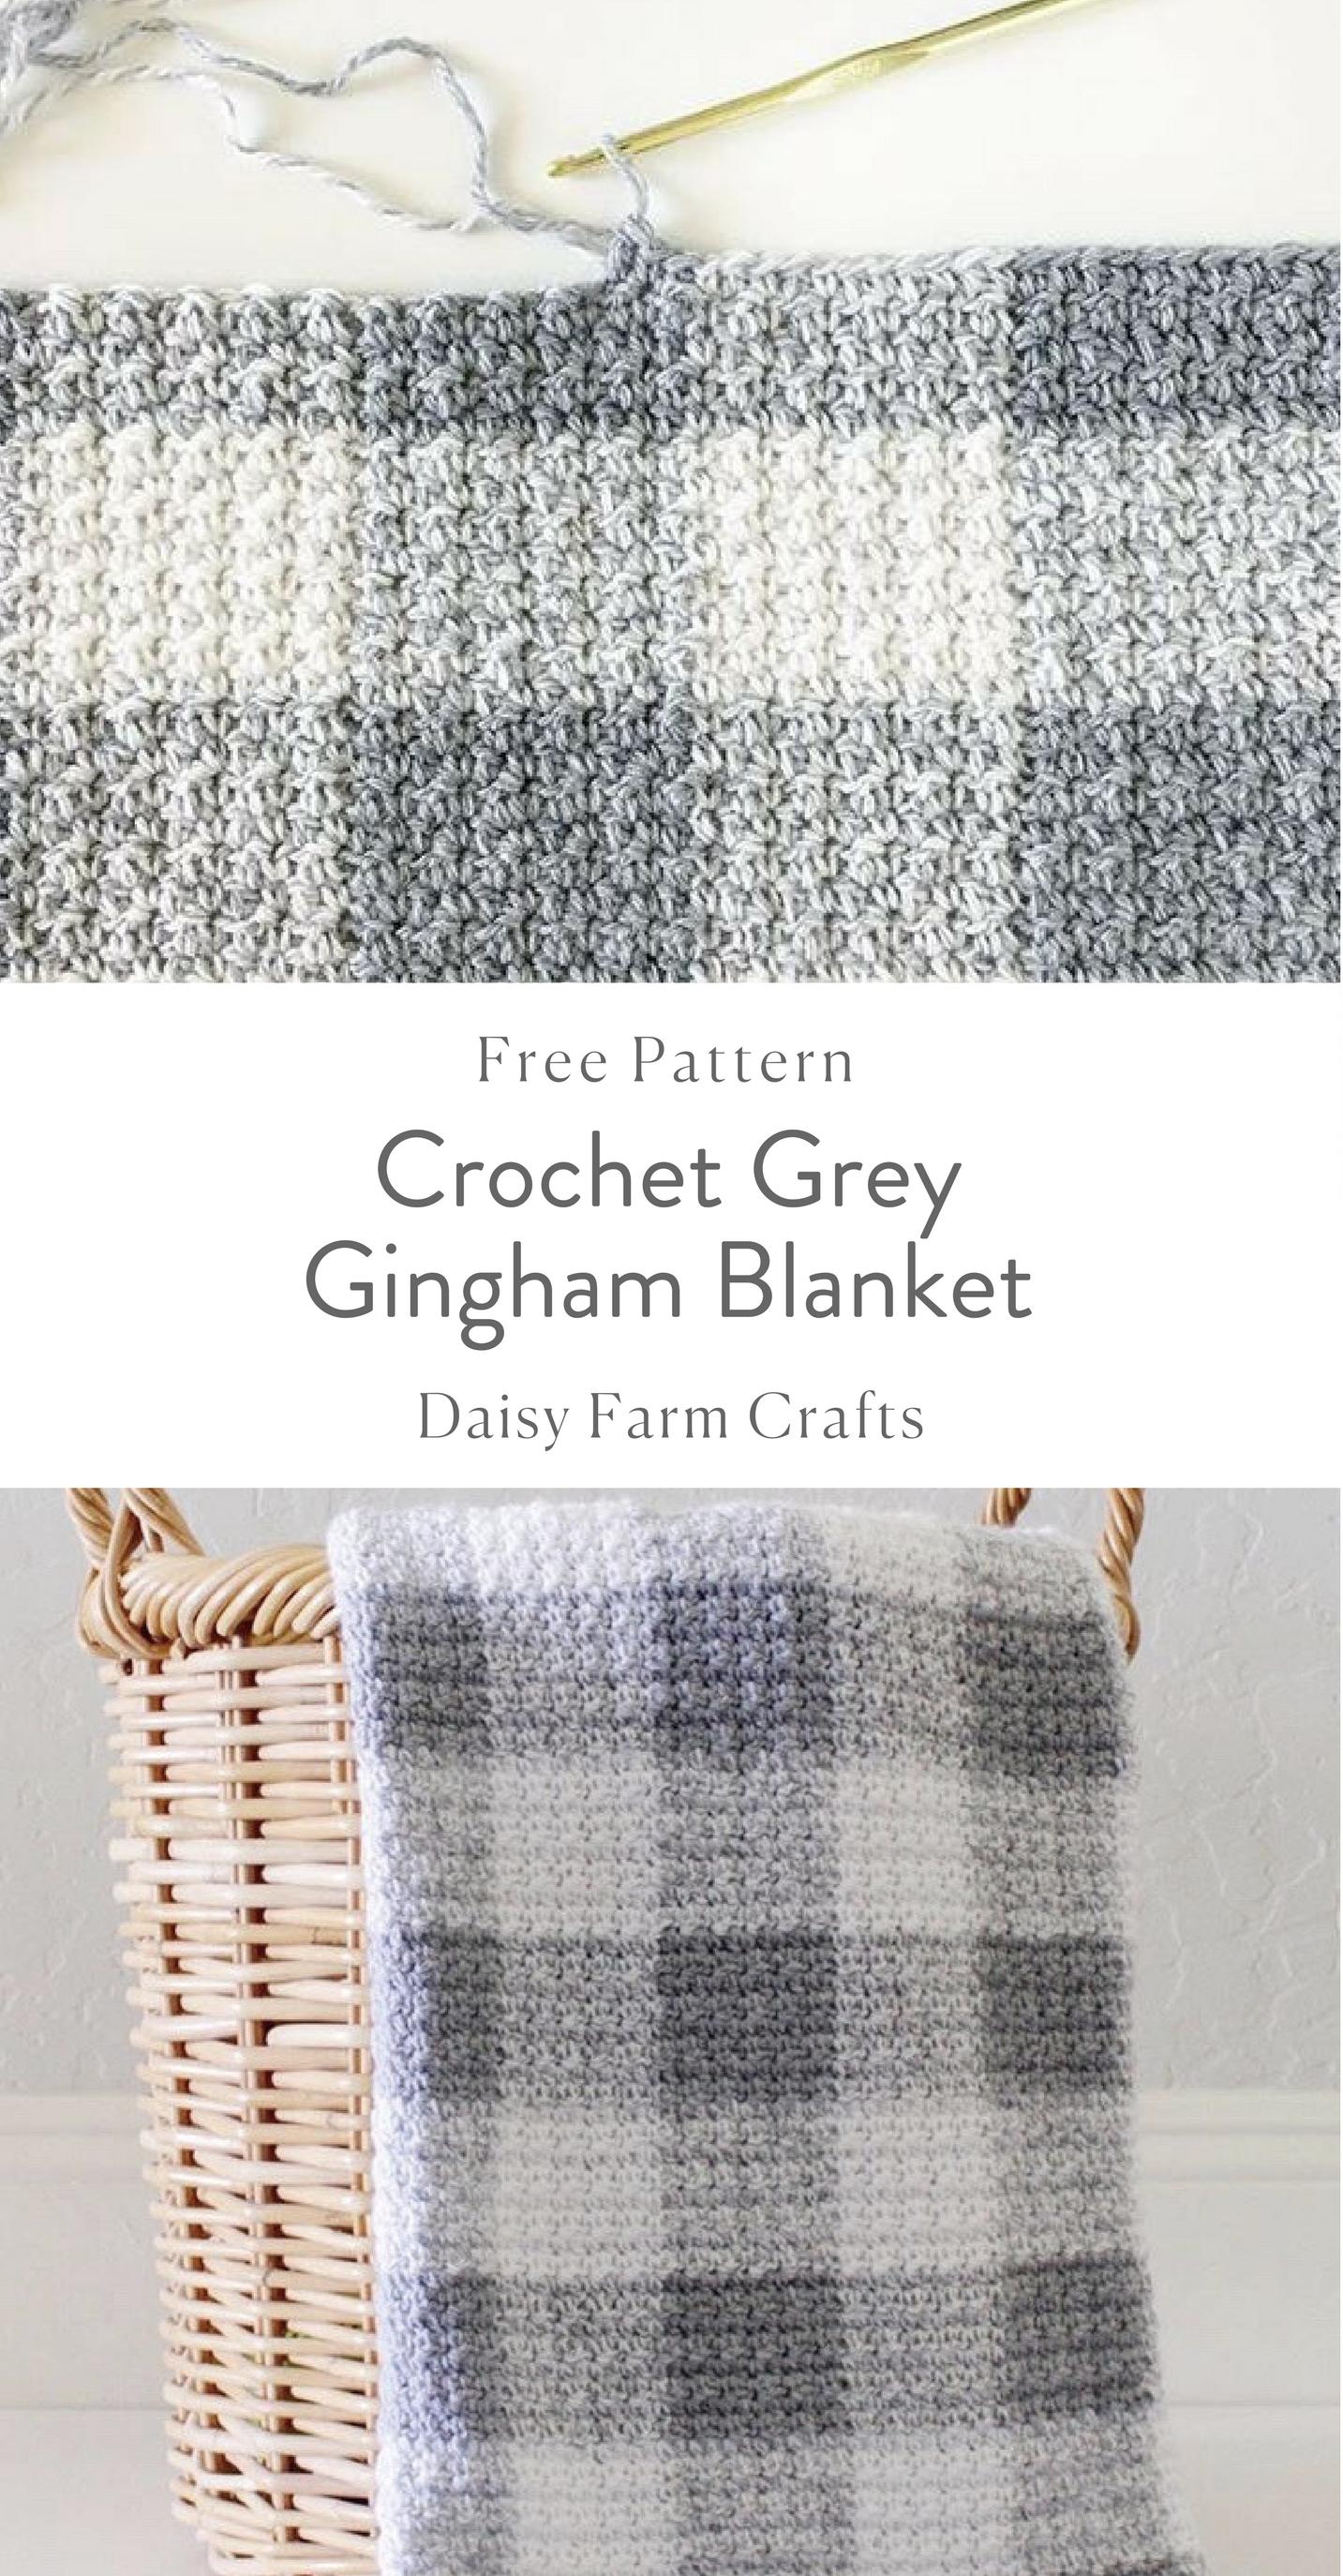 Crochet Grey Gingham Blanket - Free Pattern | Crocheted Afghans ...